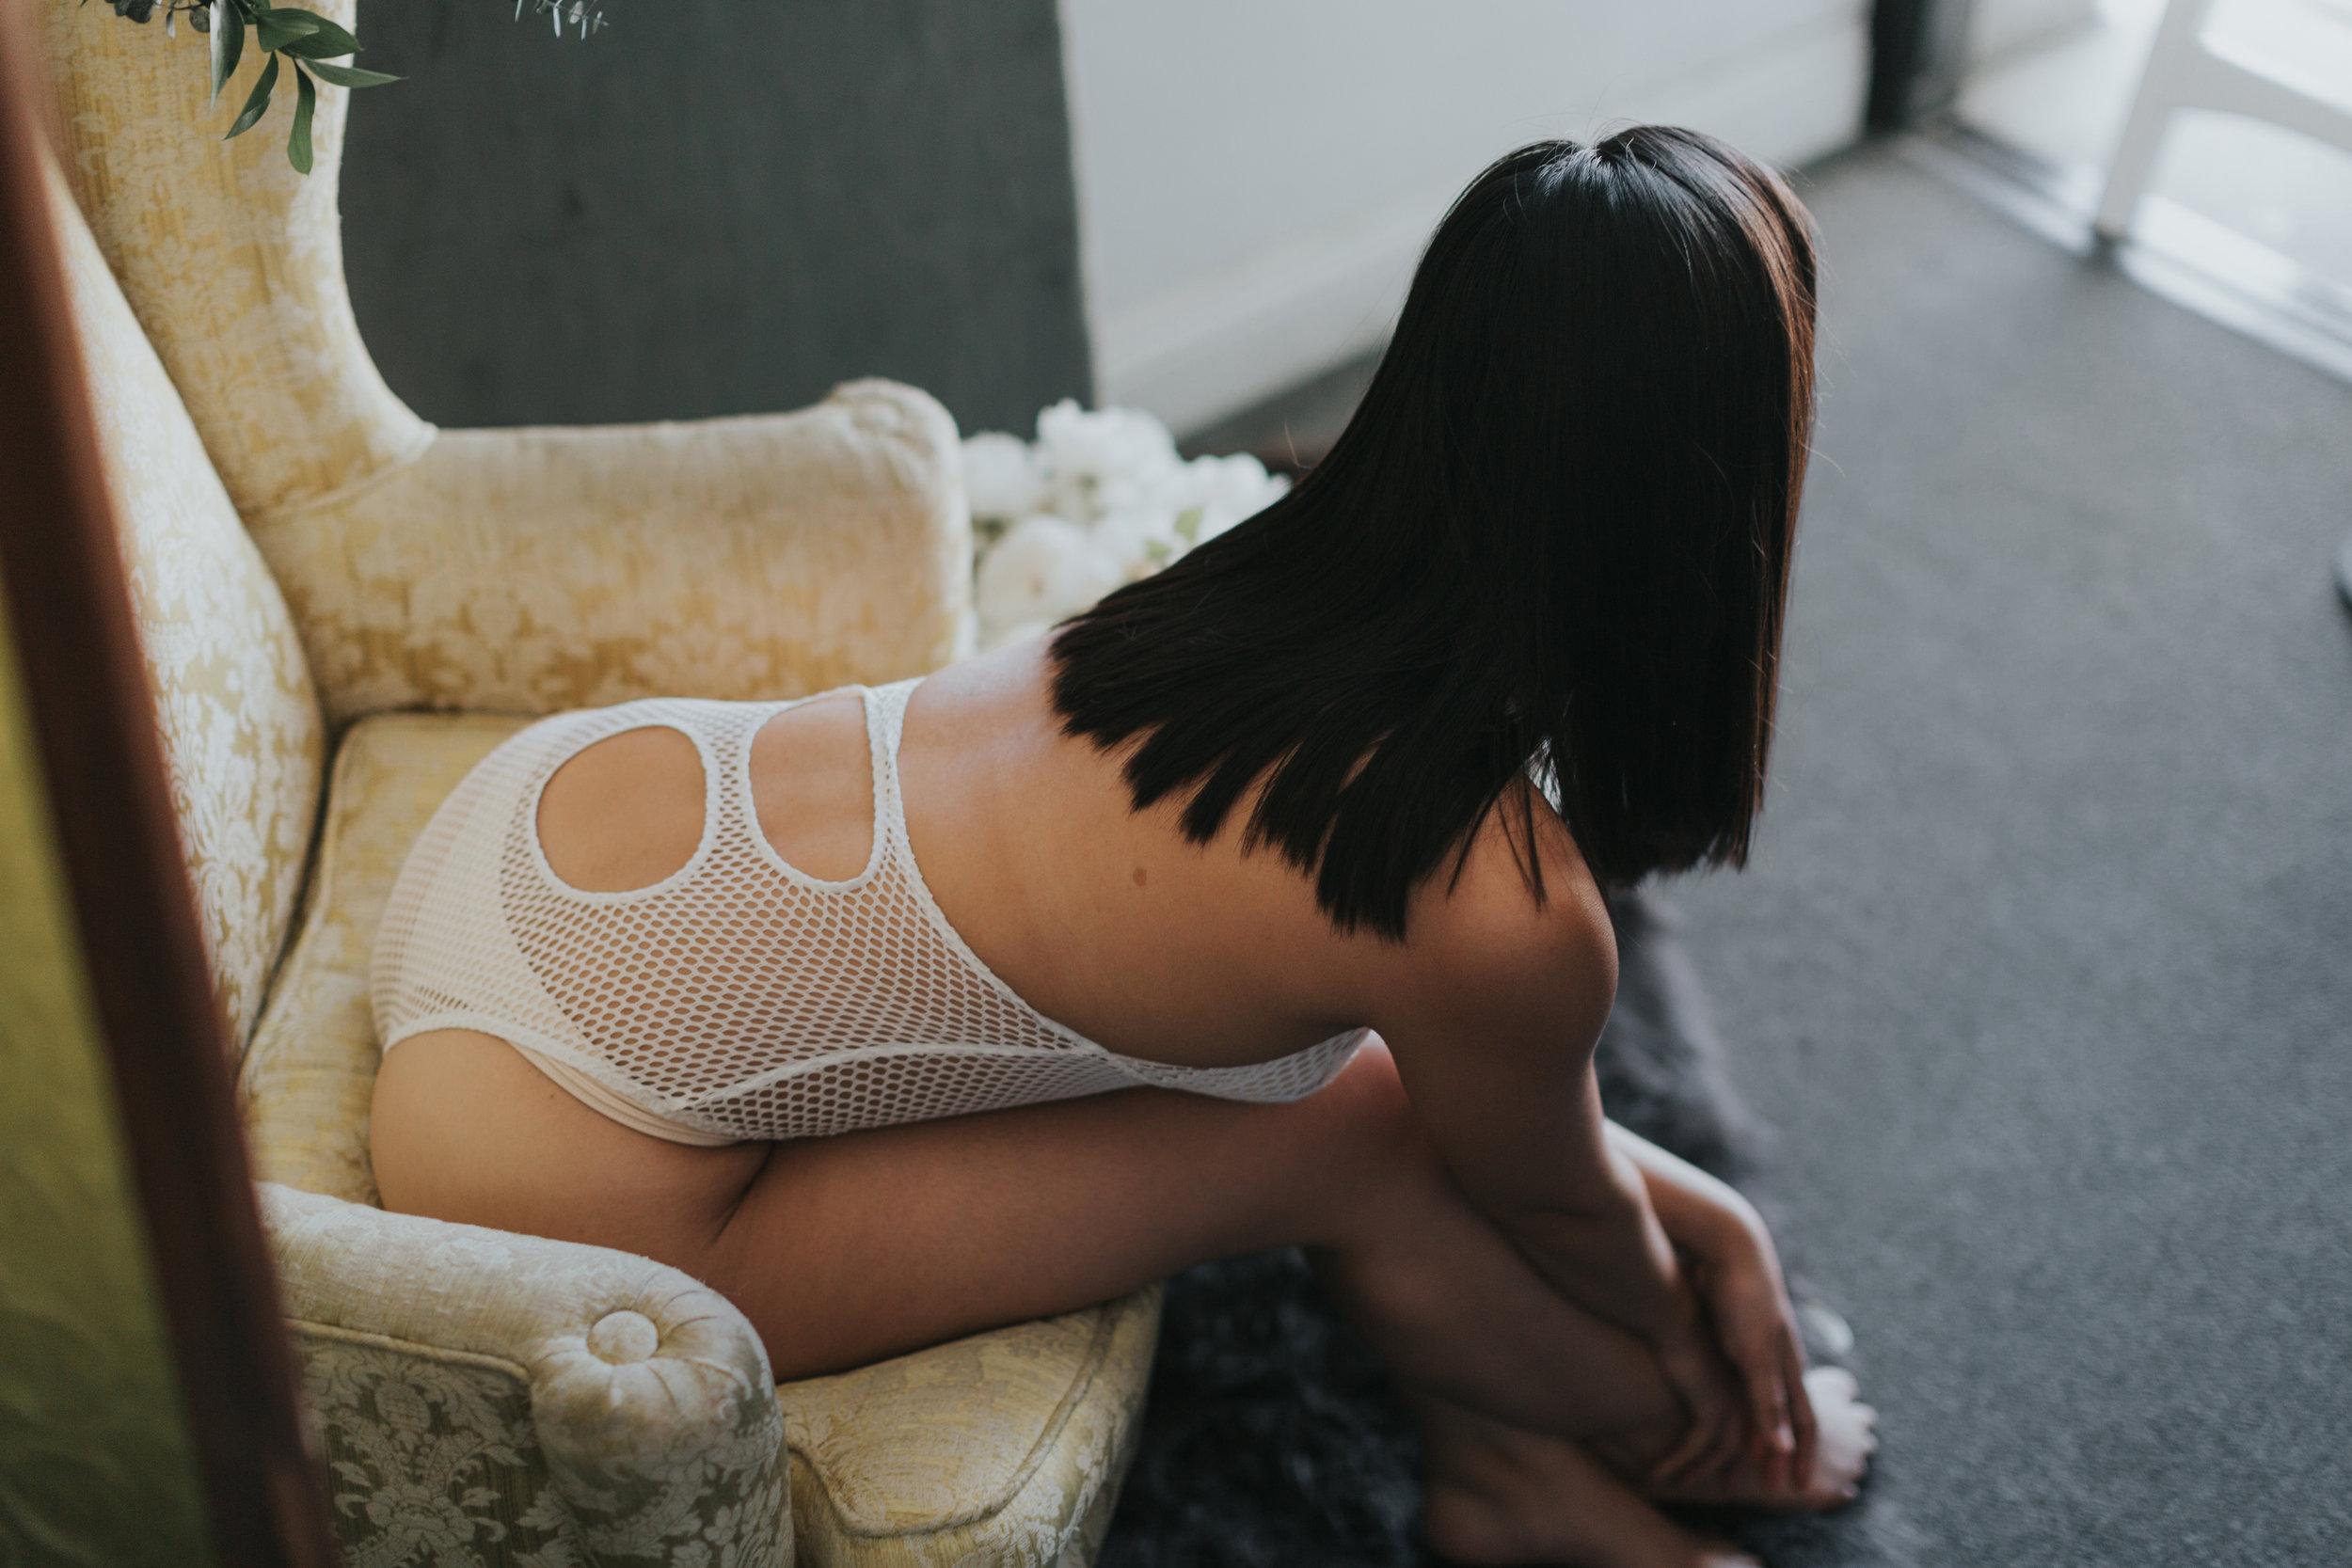 Stefanie-14-2.jpg